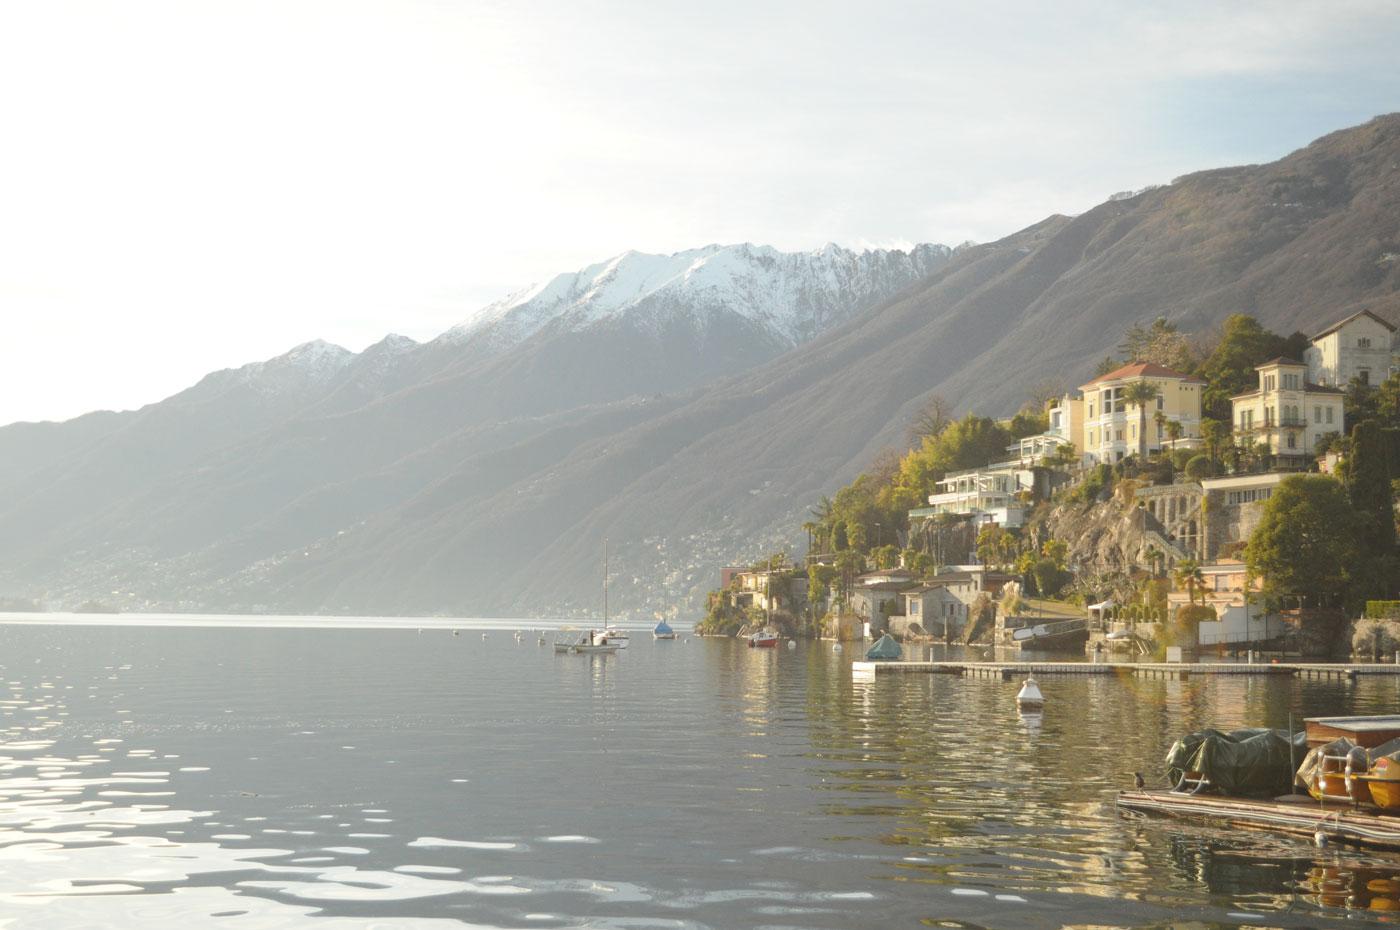 unterwegs-reiseblog-ascona-lugano-01